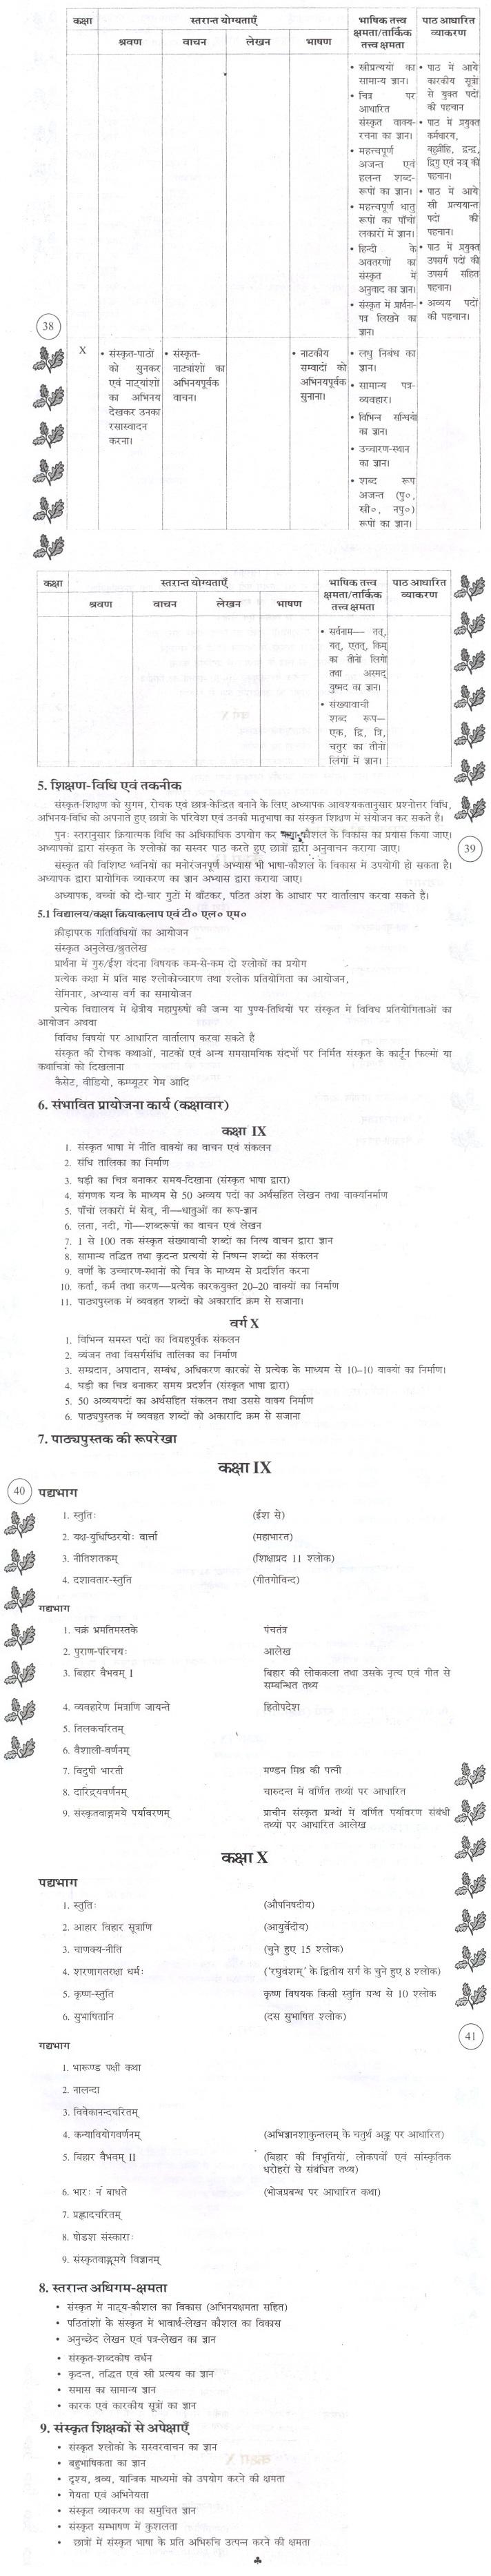 BSEB Syllabus For Class 9th 10th Second Indian Language (Sanskrit) 2018-19 Bihar Board Syllabus PDF Download